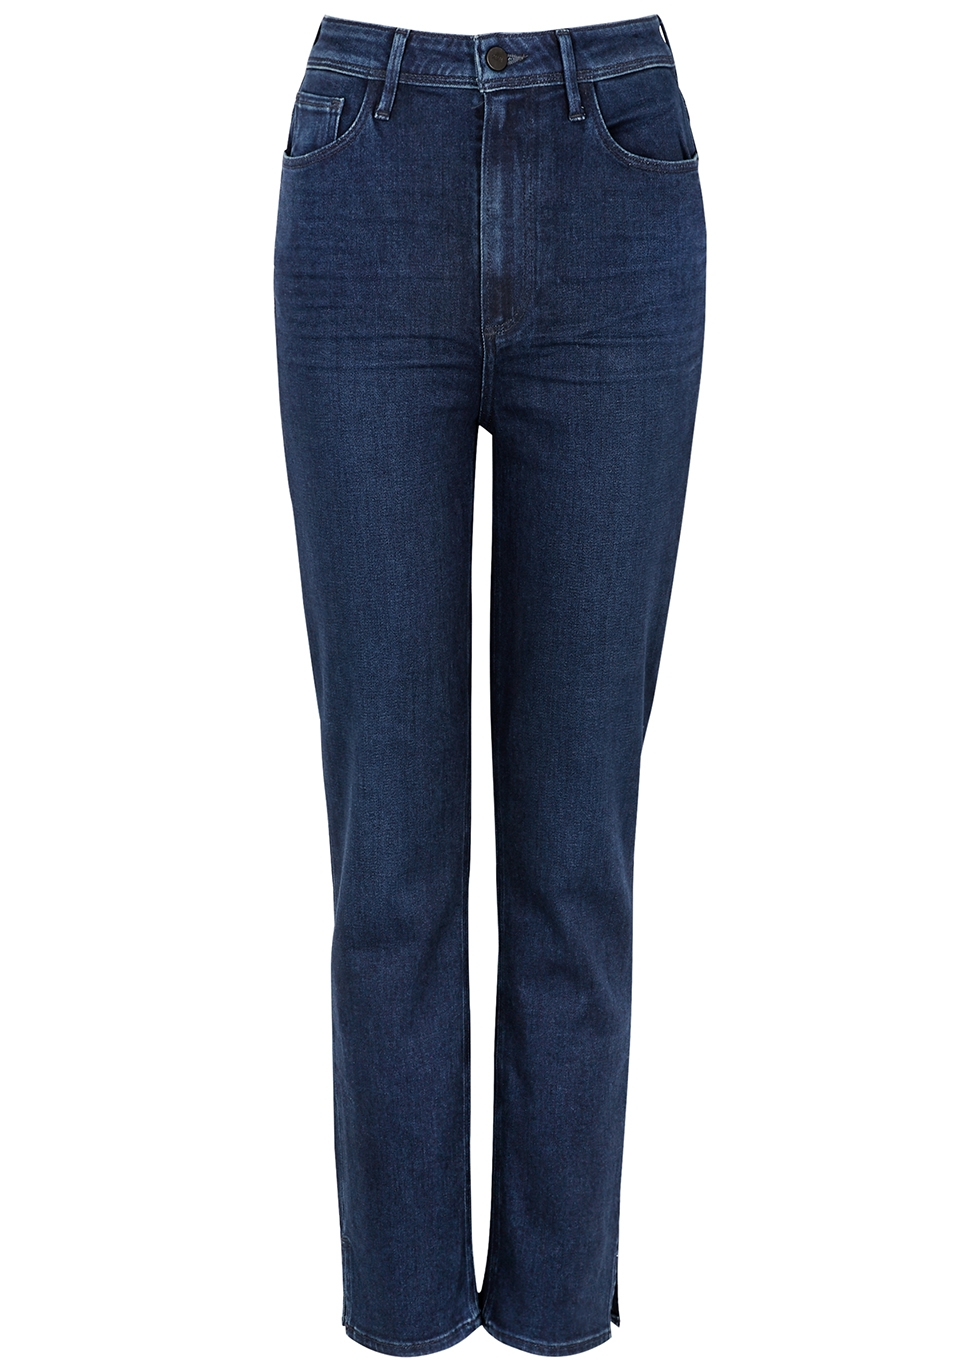 Cindy Transcend dark blue straight-leg jeans